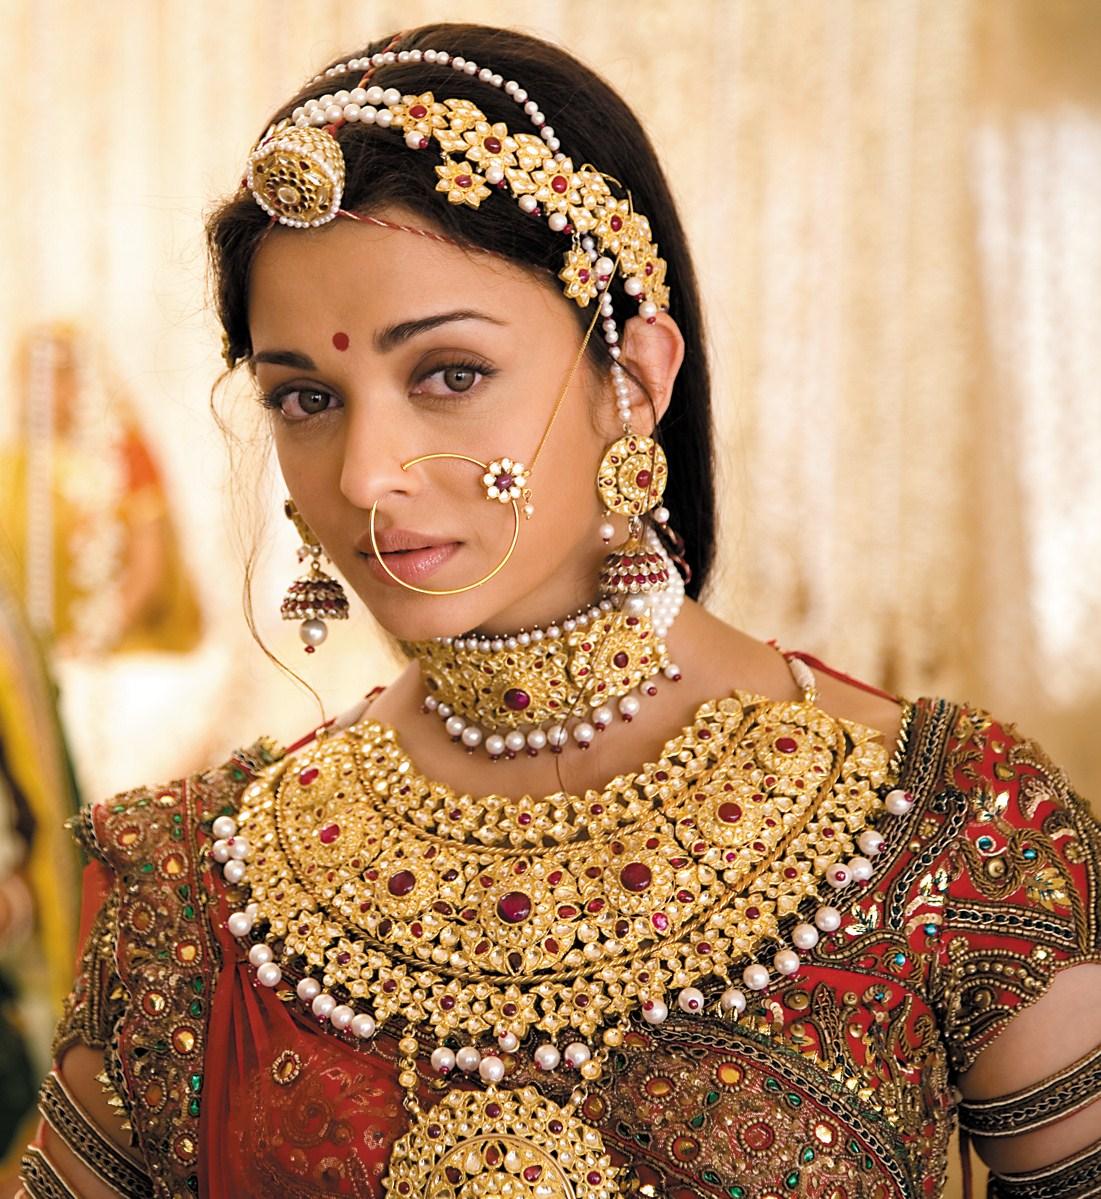 http://1.bp.blogspot.com/-JHE_ZQecShk/TyfAY1sbjDI/AAAAAAAABAo/2pEXylmV62M/s1600/Indian-Bridal-Jewelry-2.jpg